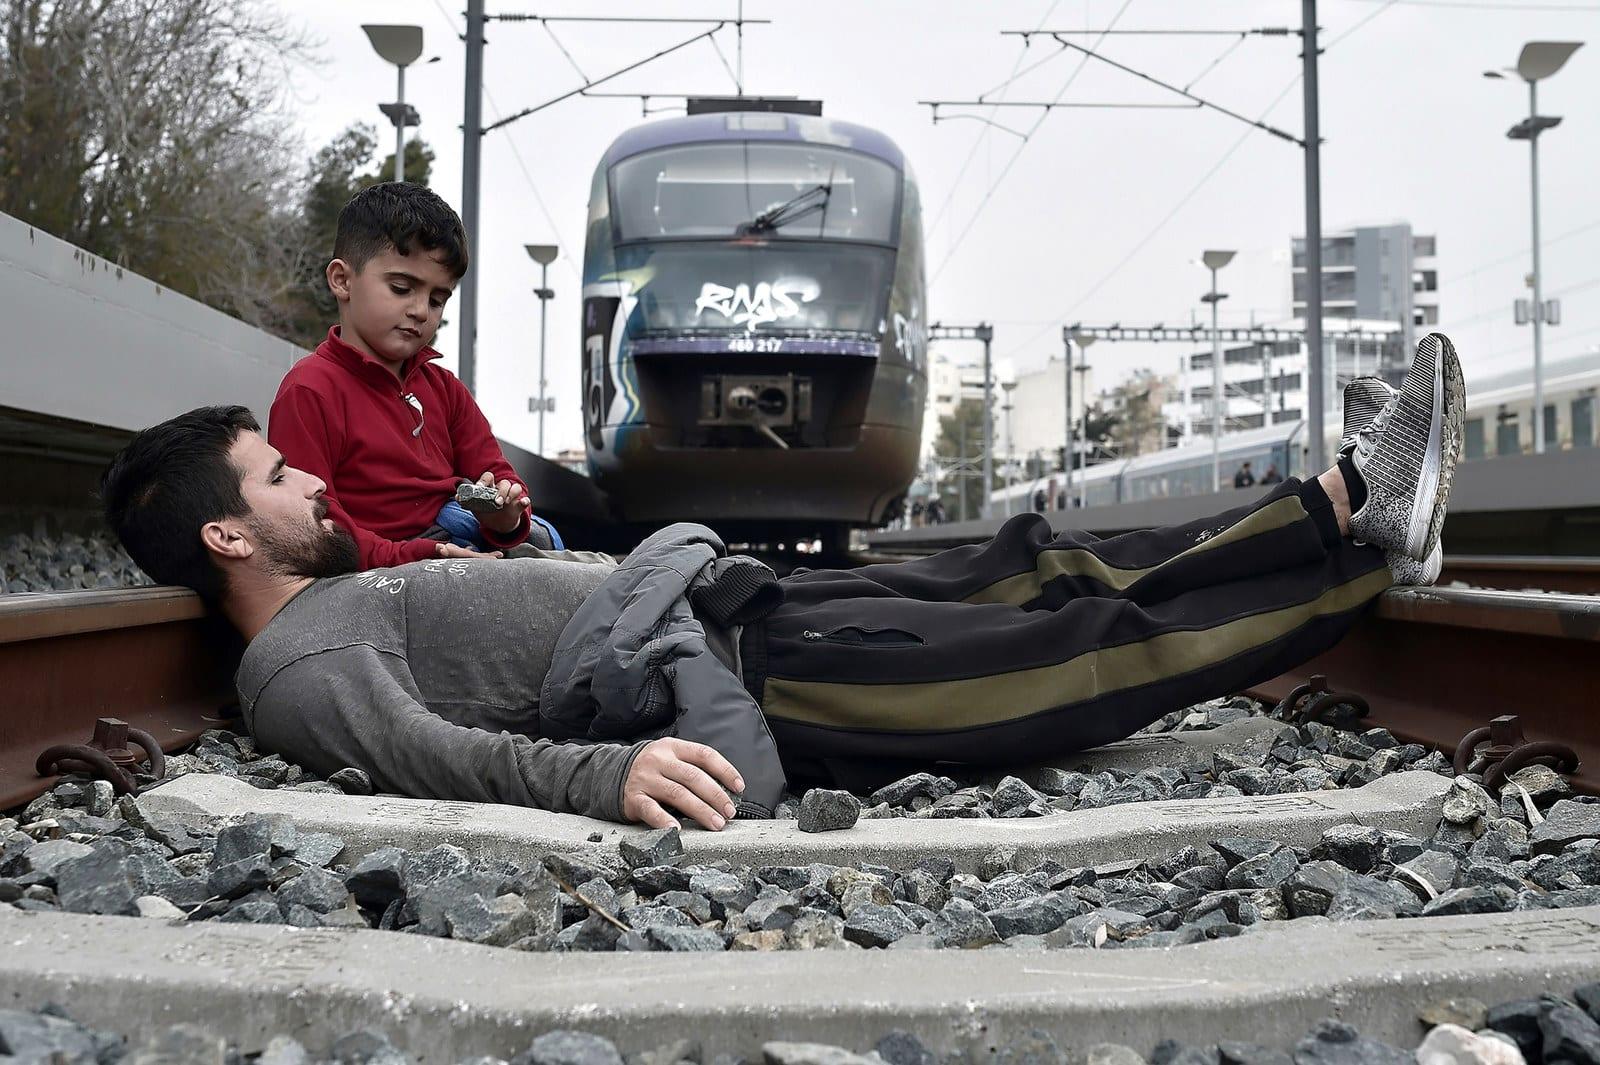 Milos Bicanski/Getty Images/Scanpix